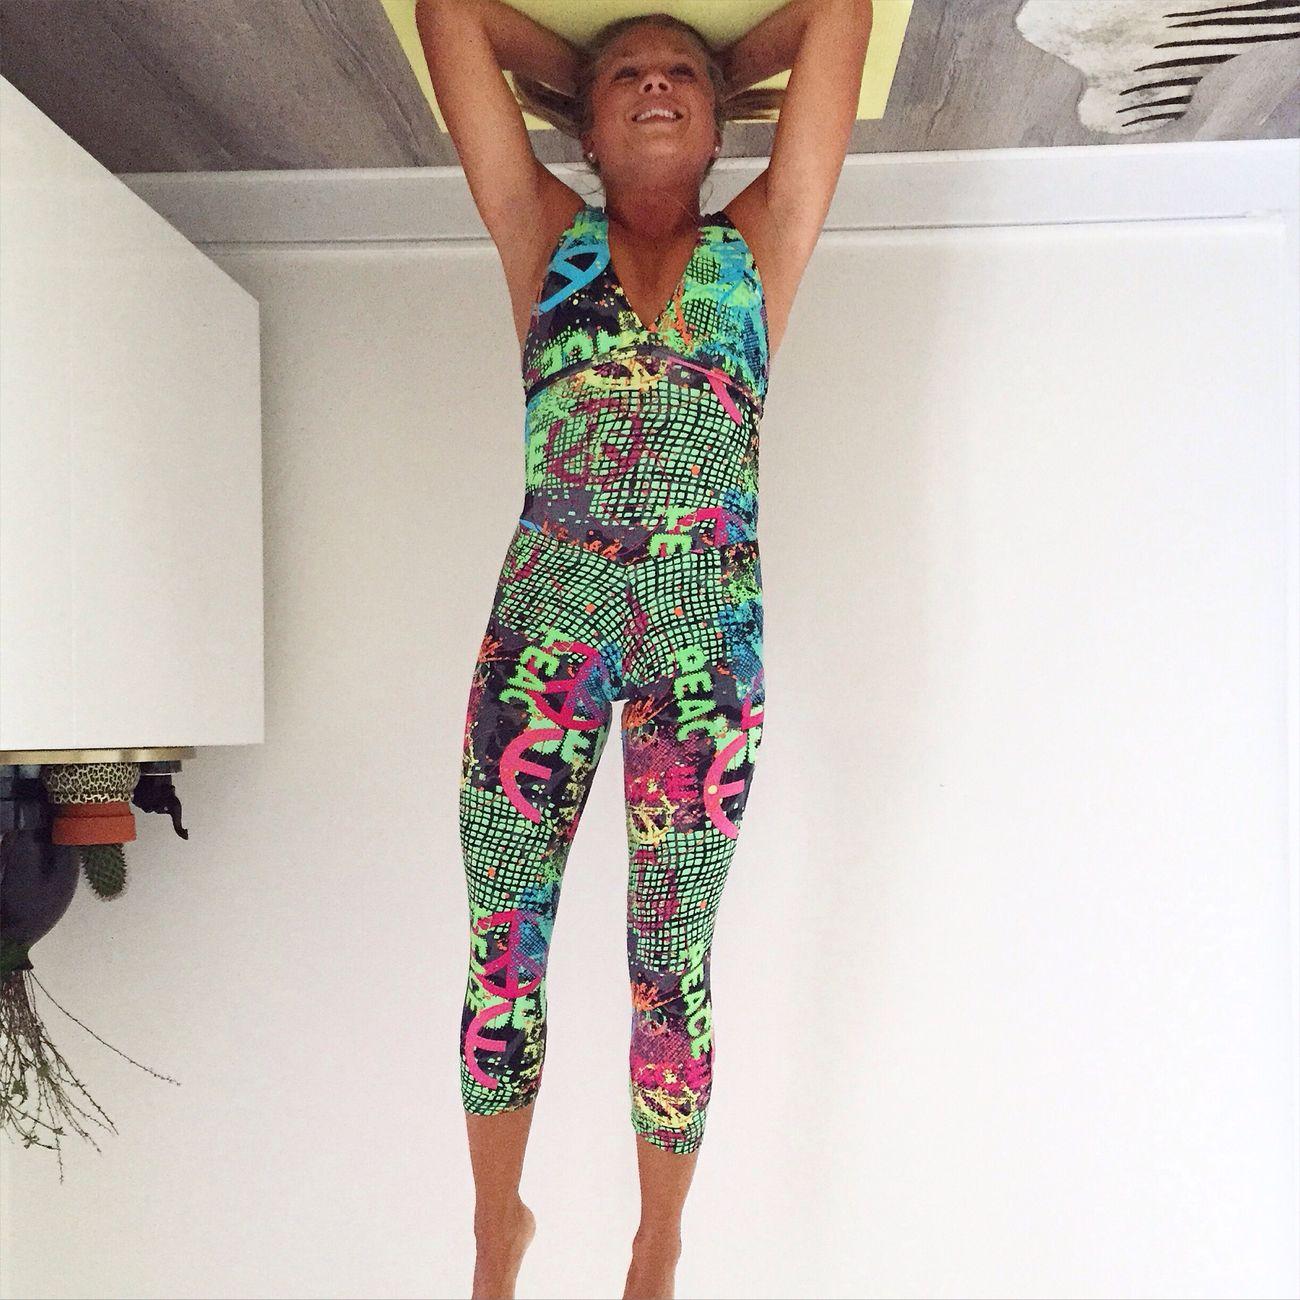 Yoga Girl Blogg Yogagirl #sweden #styling